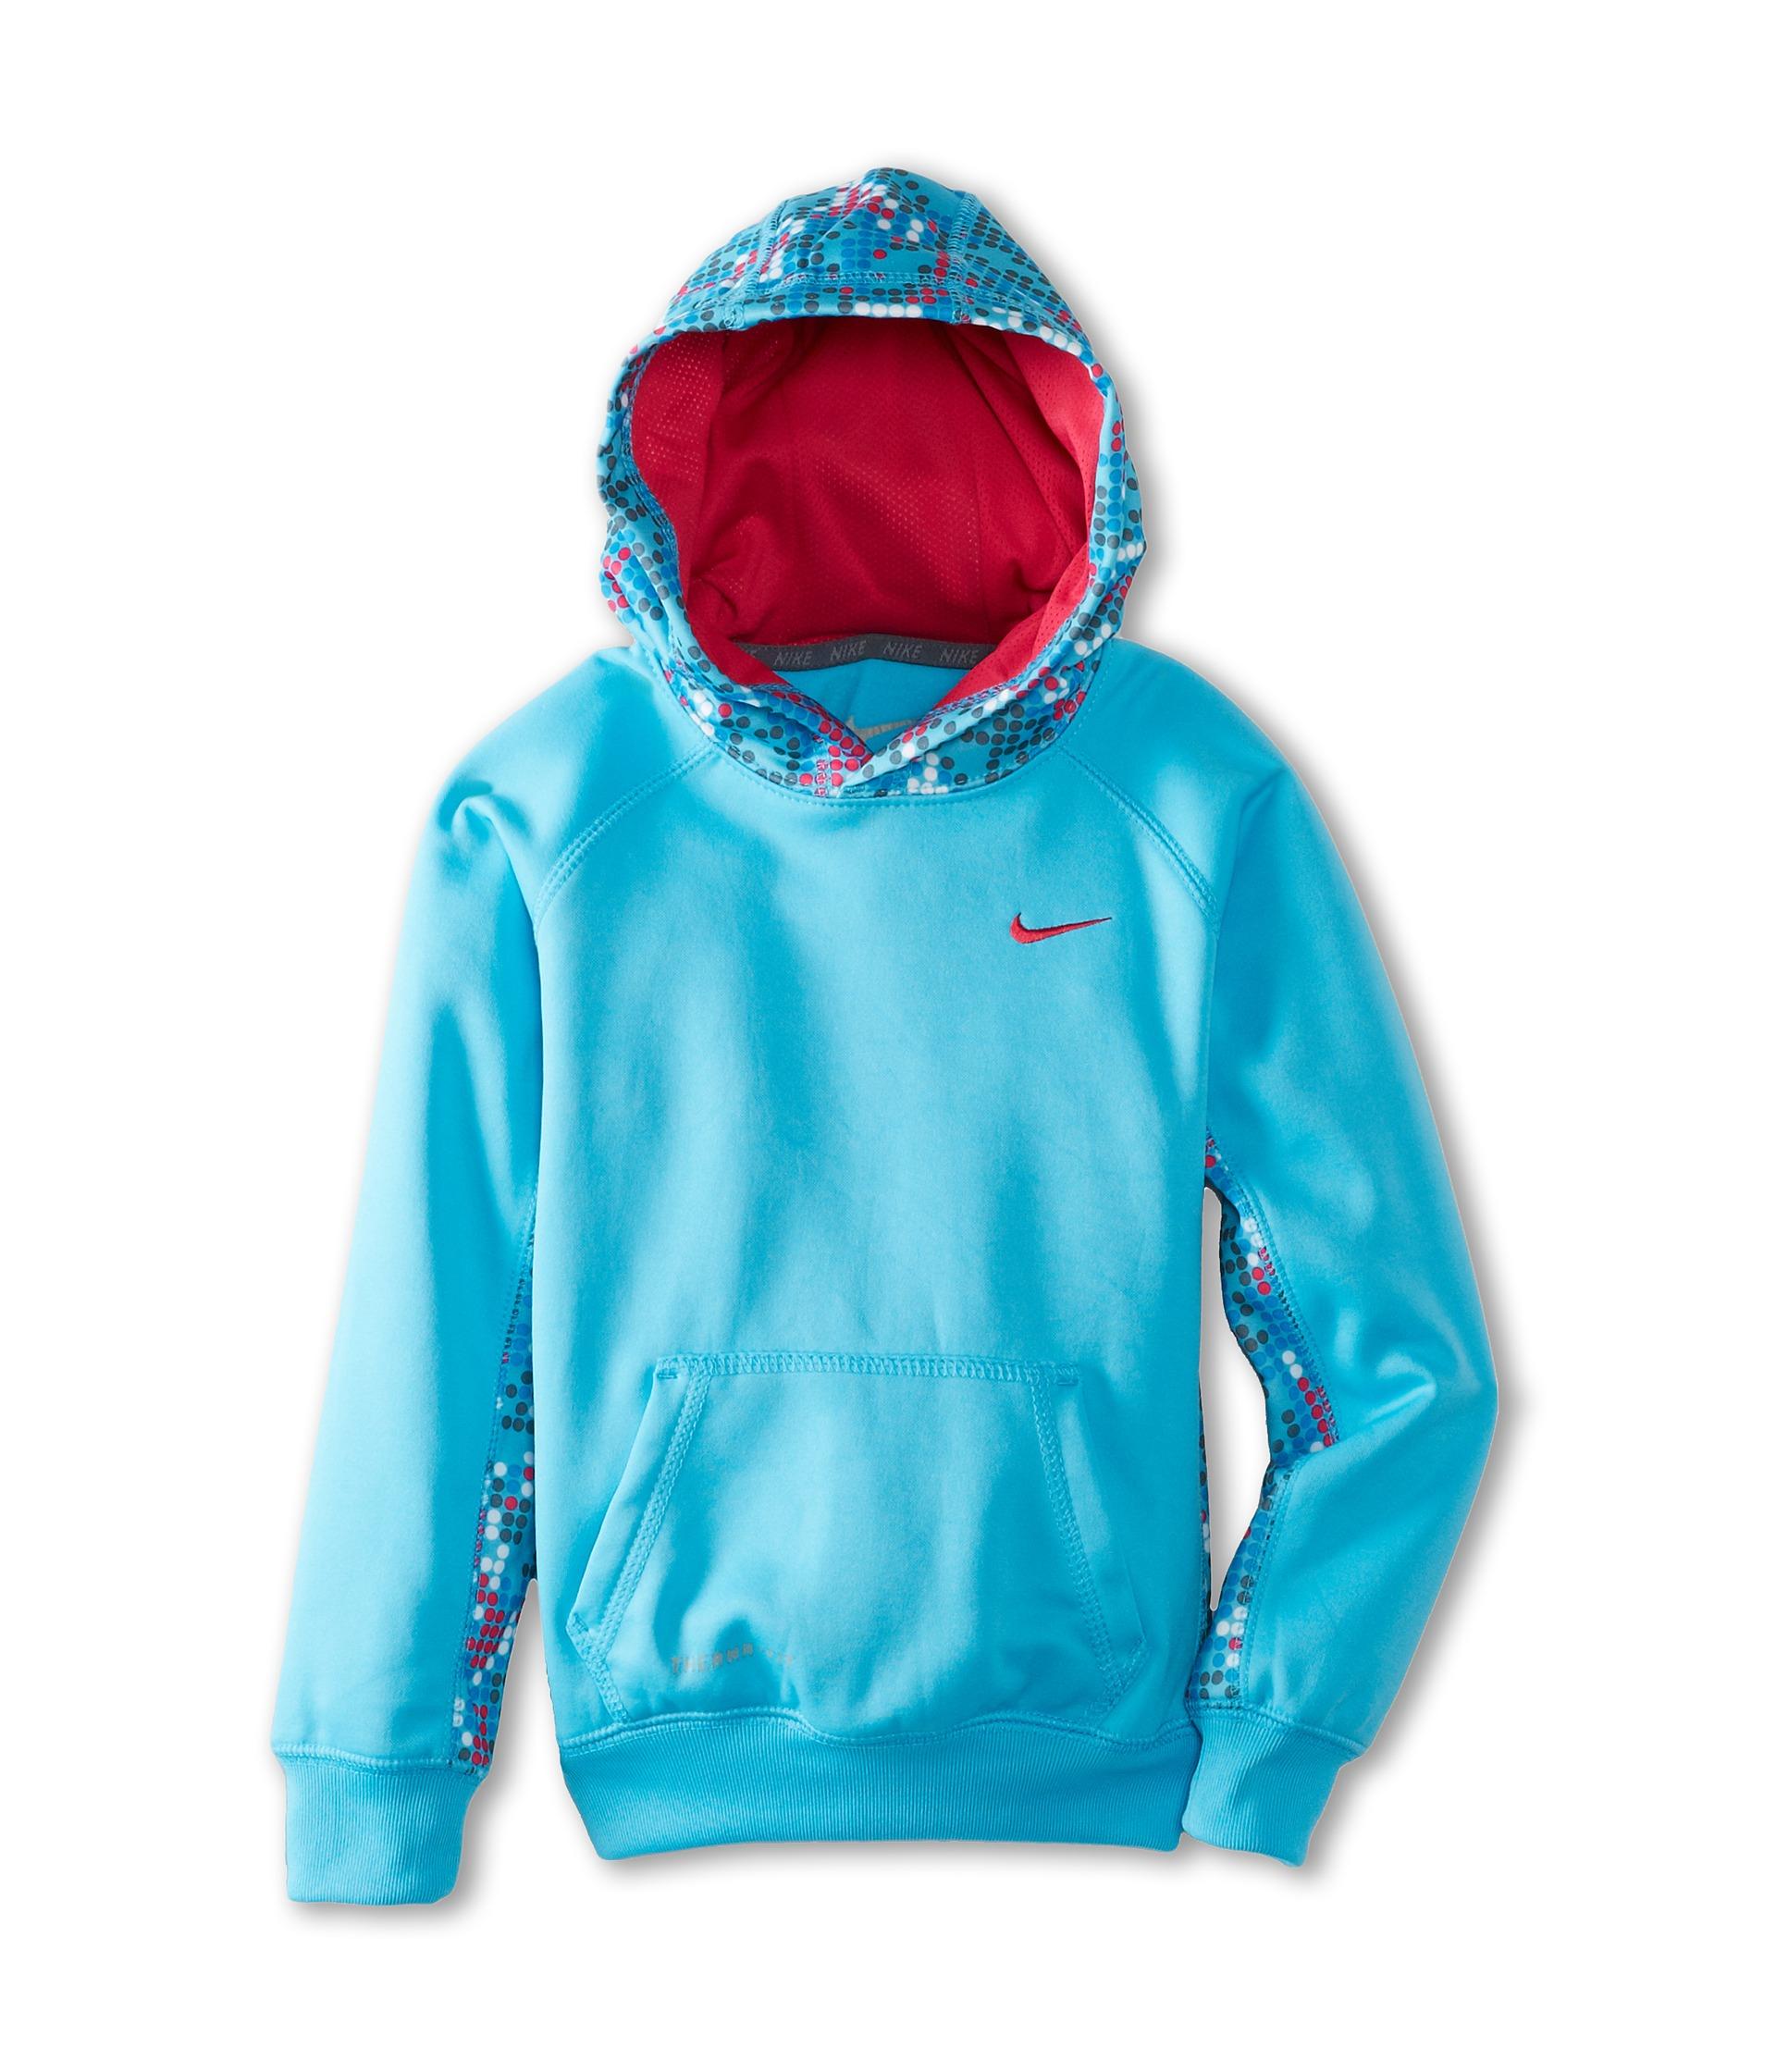 Nike girl hoodies